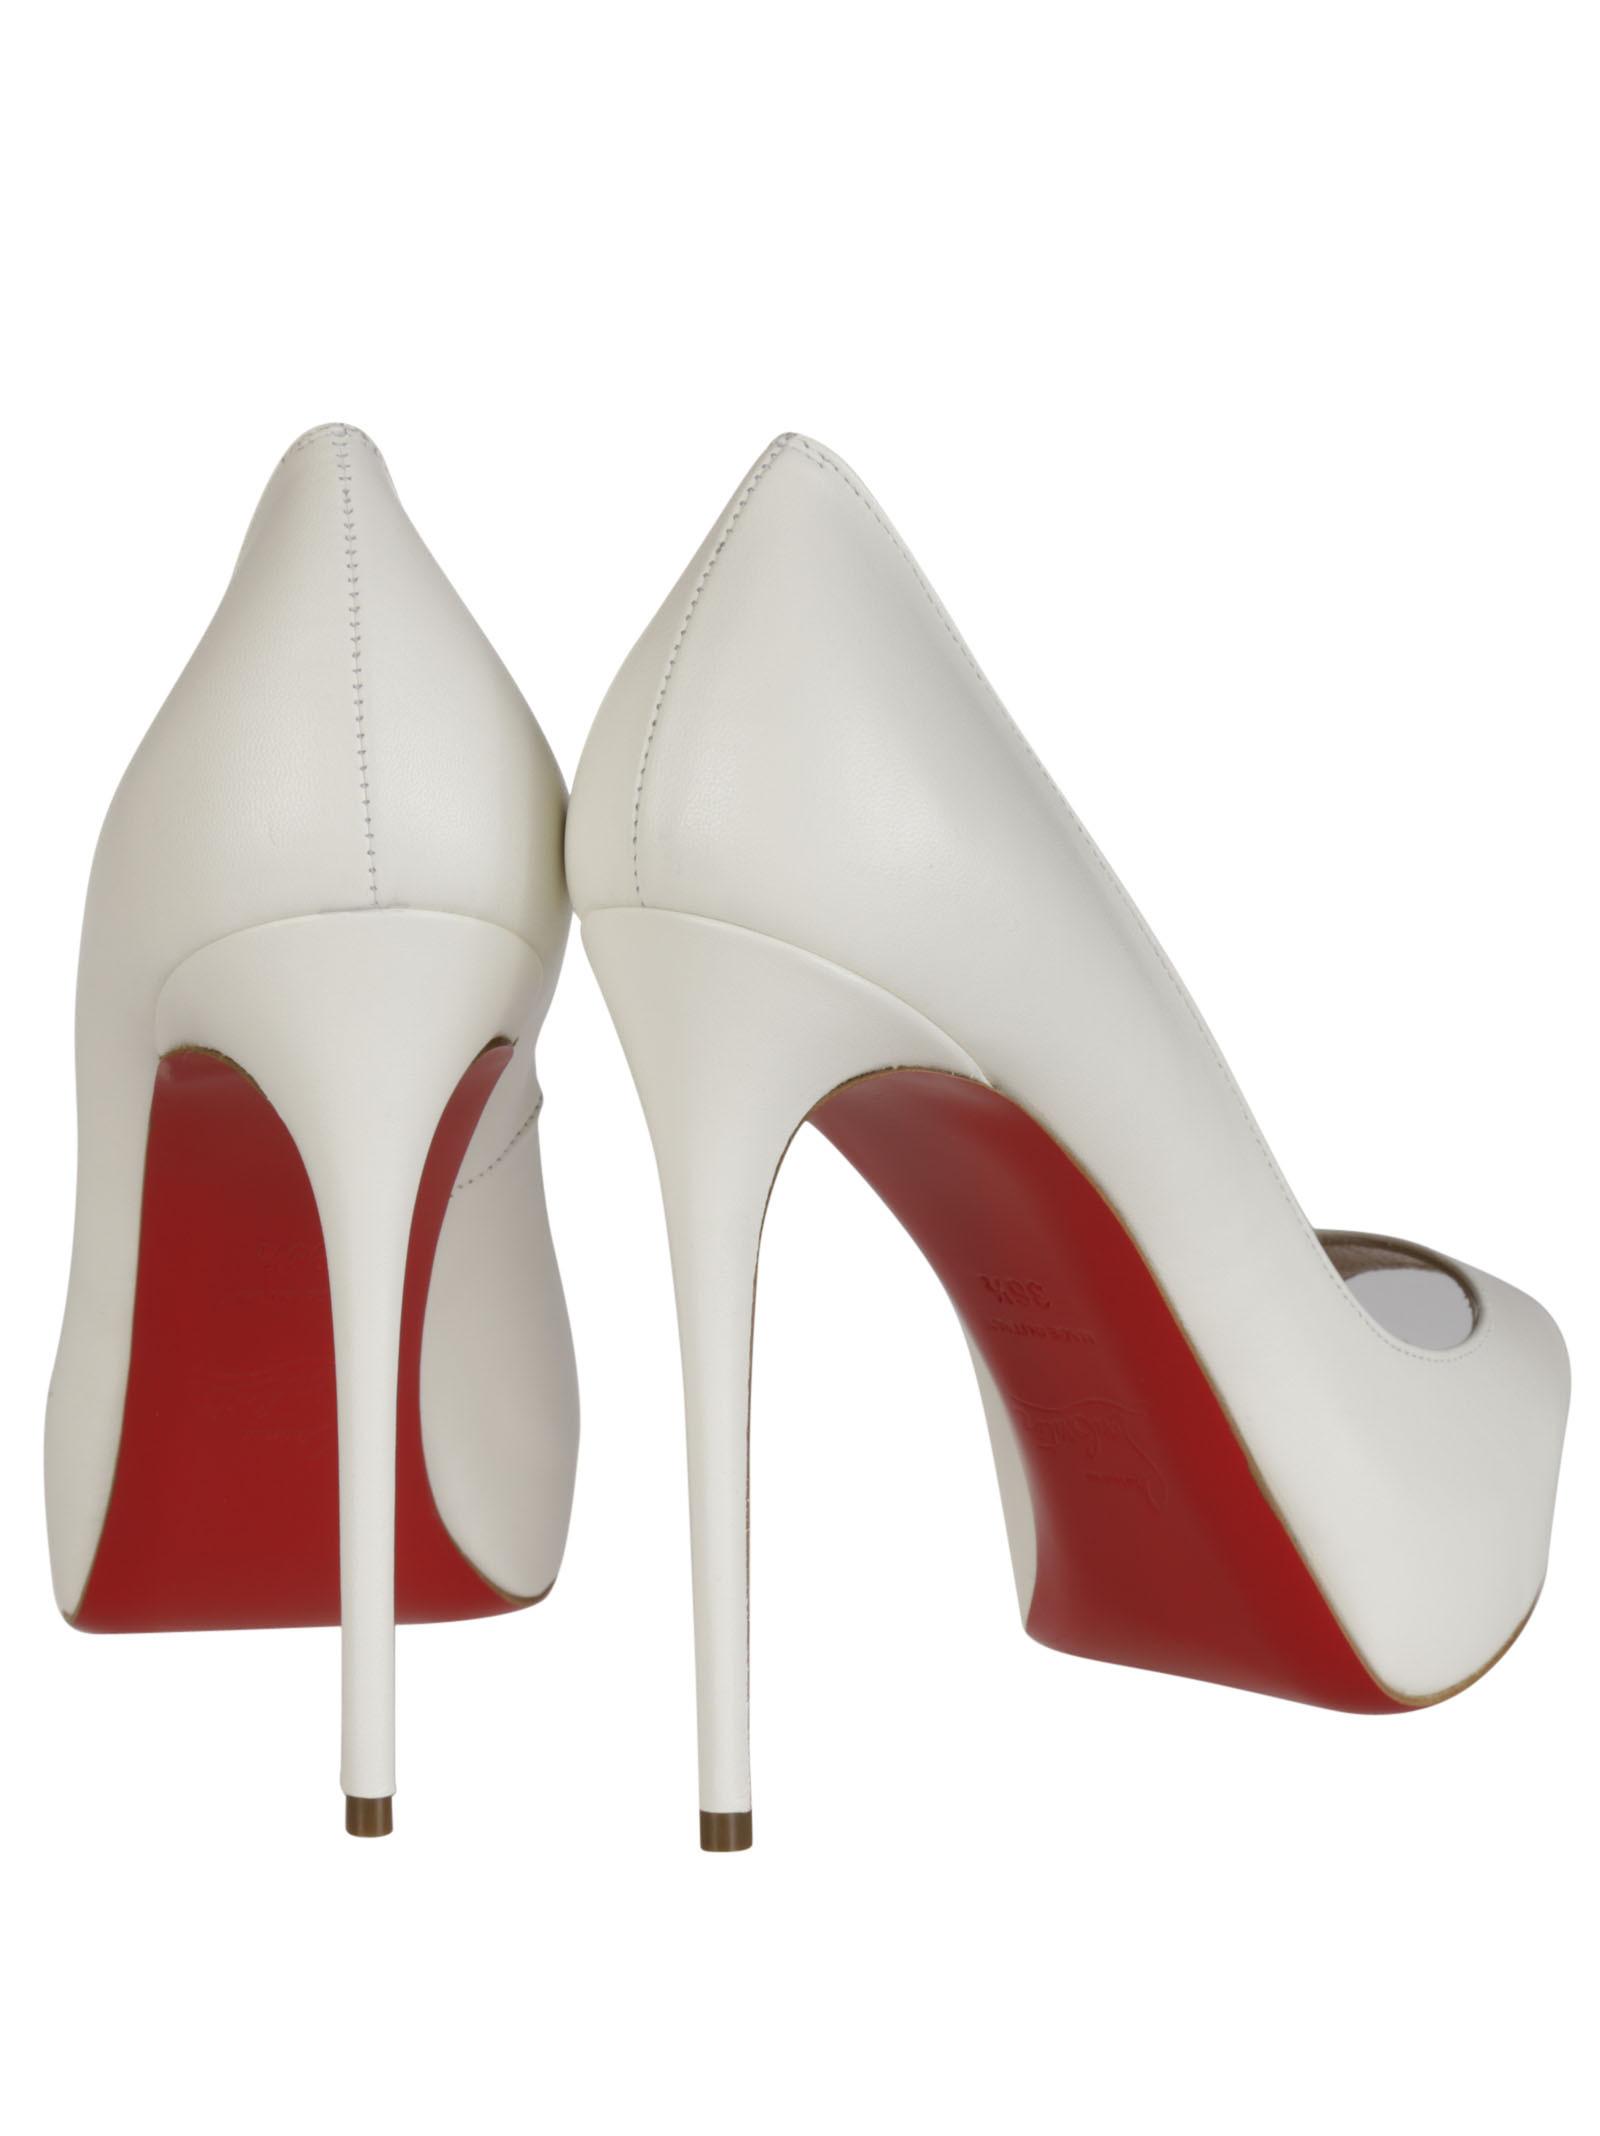 christian lebouton shoes - Christian Louboutin | Italist